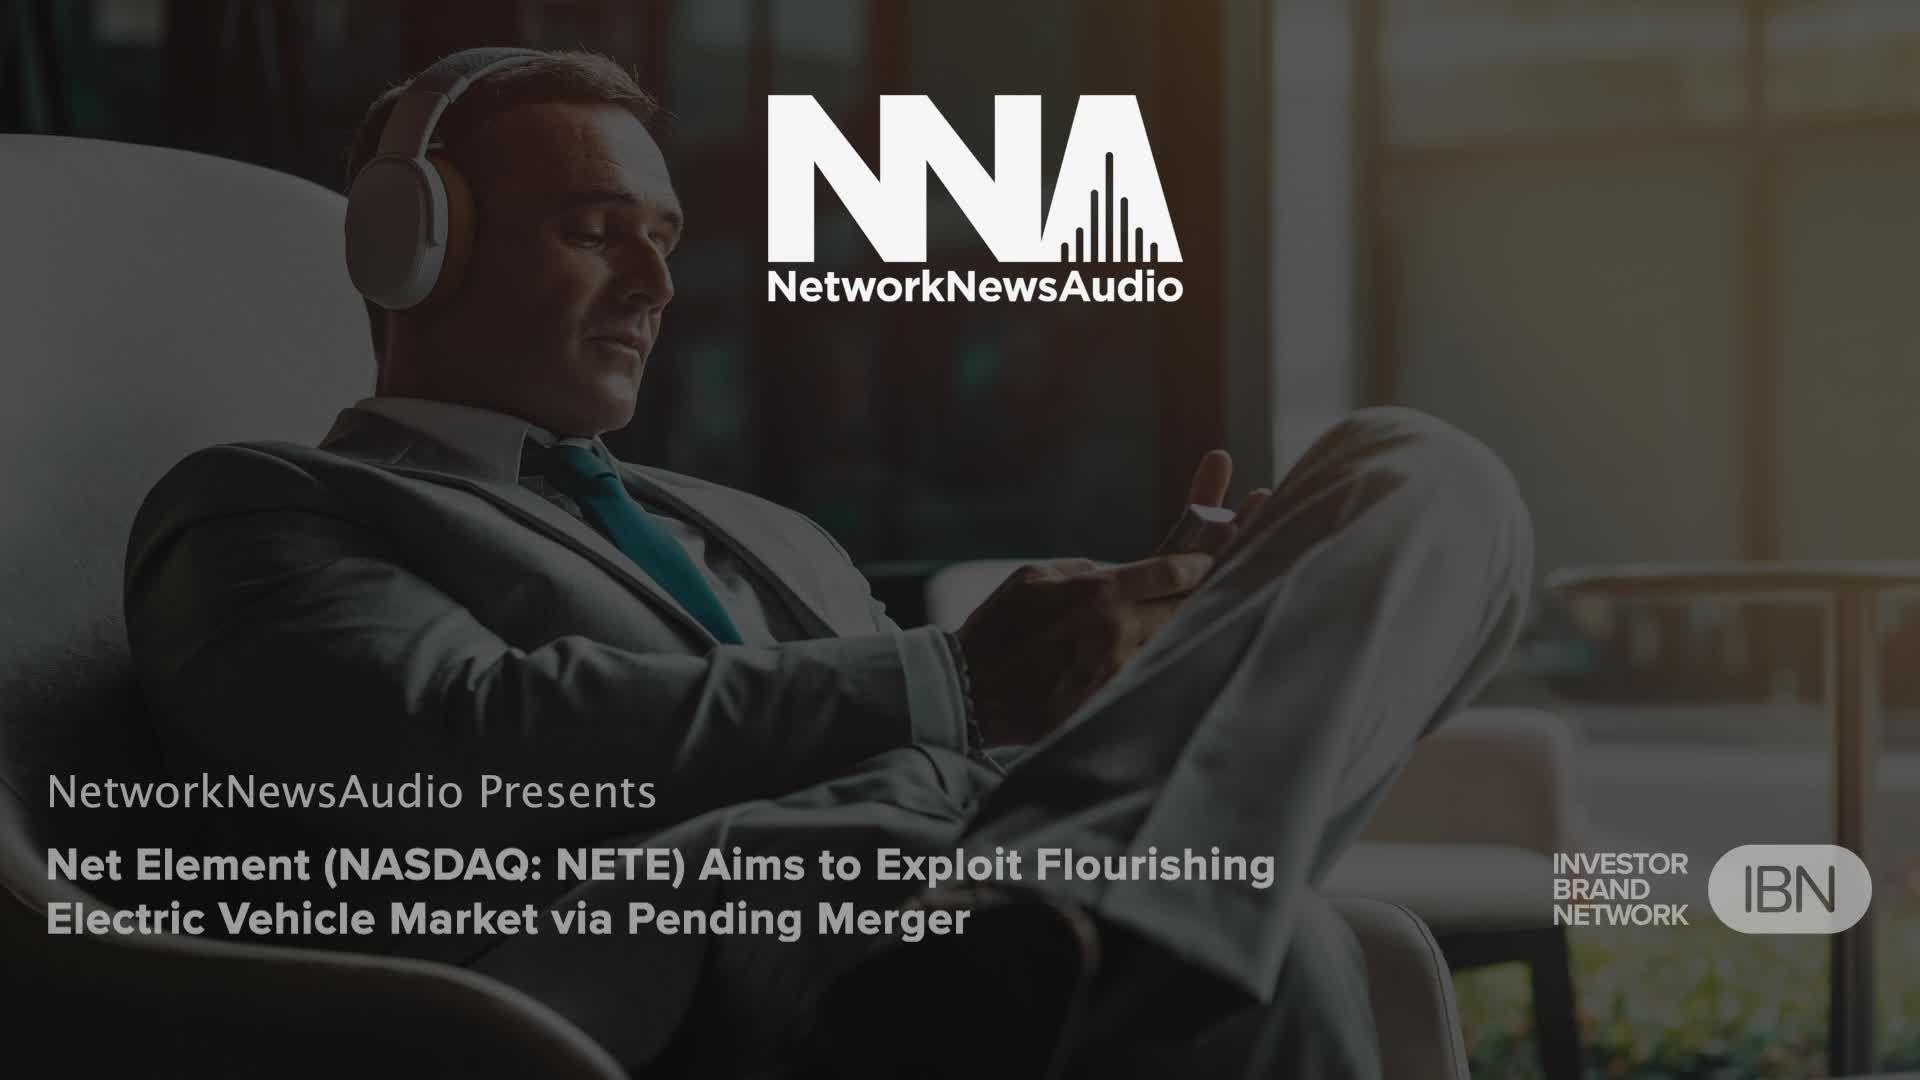 NetworkNewsAudio News-Net Element (NASDAQ: NETE) Aims to Exploit Flourishing Electric Vehicle Market via Pending Merger